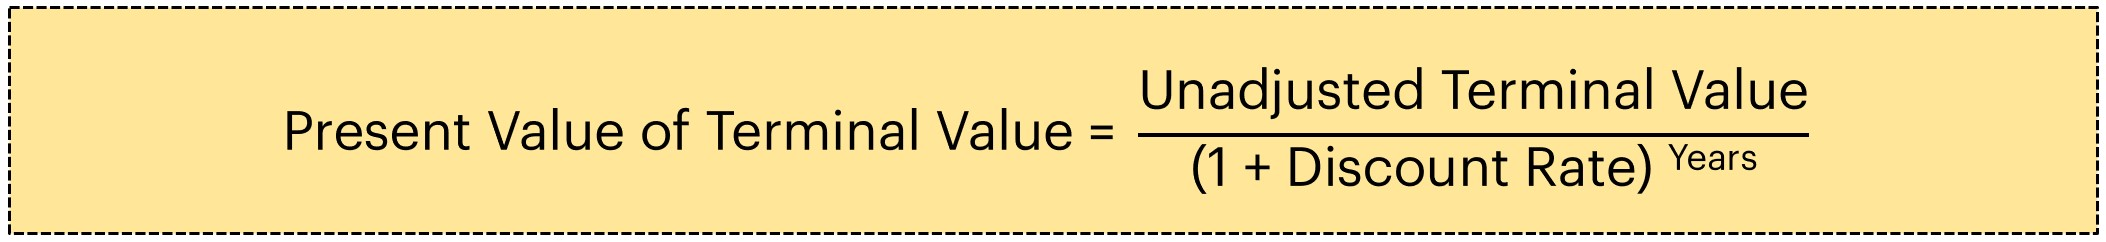 Present Value of Terminal Value Formula